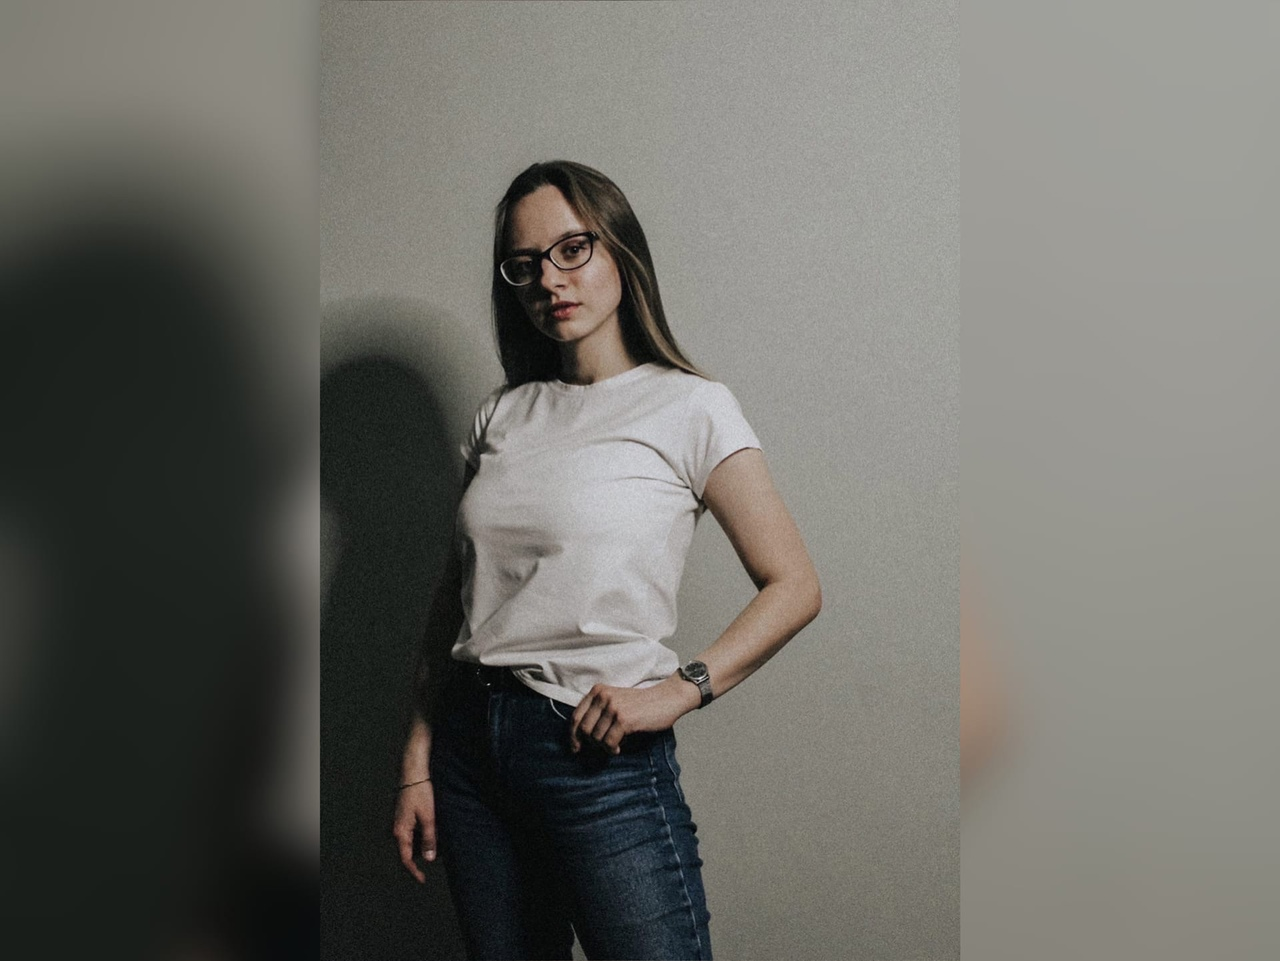 Девушка дня — Екатерина Степанова!